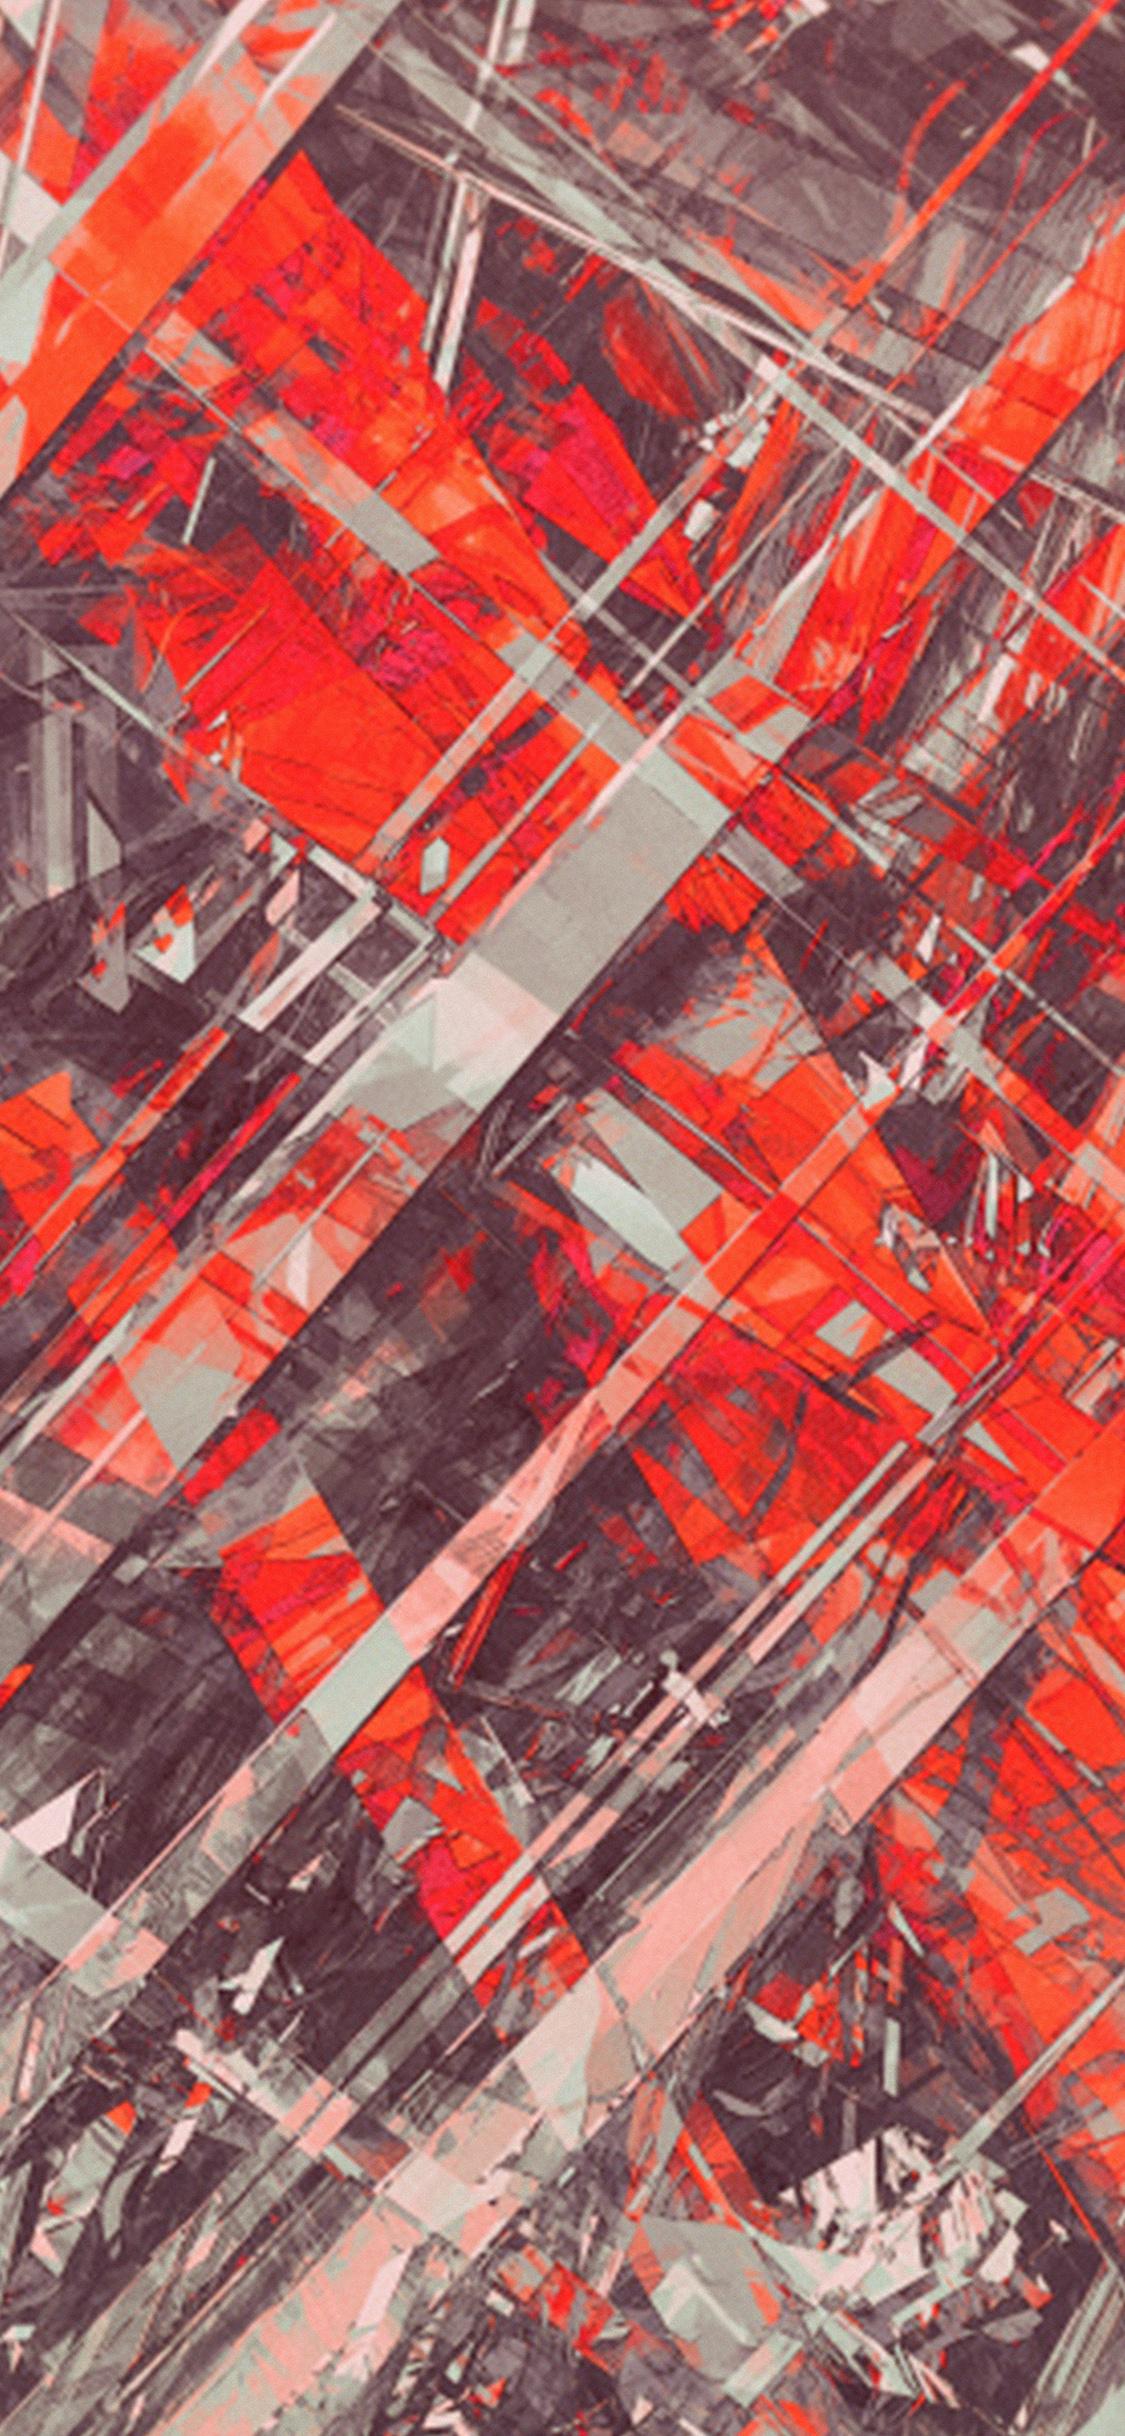 iPhonexpapers.com-Apple-iPhone-wallpaper-az31-red-atelier-olschinsky-illustration-art